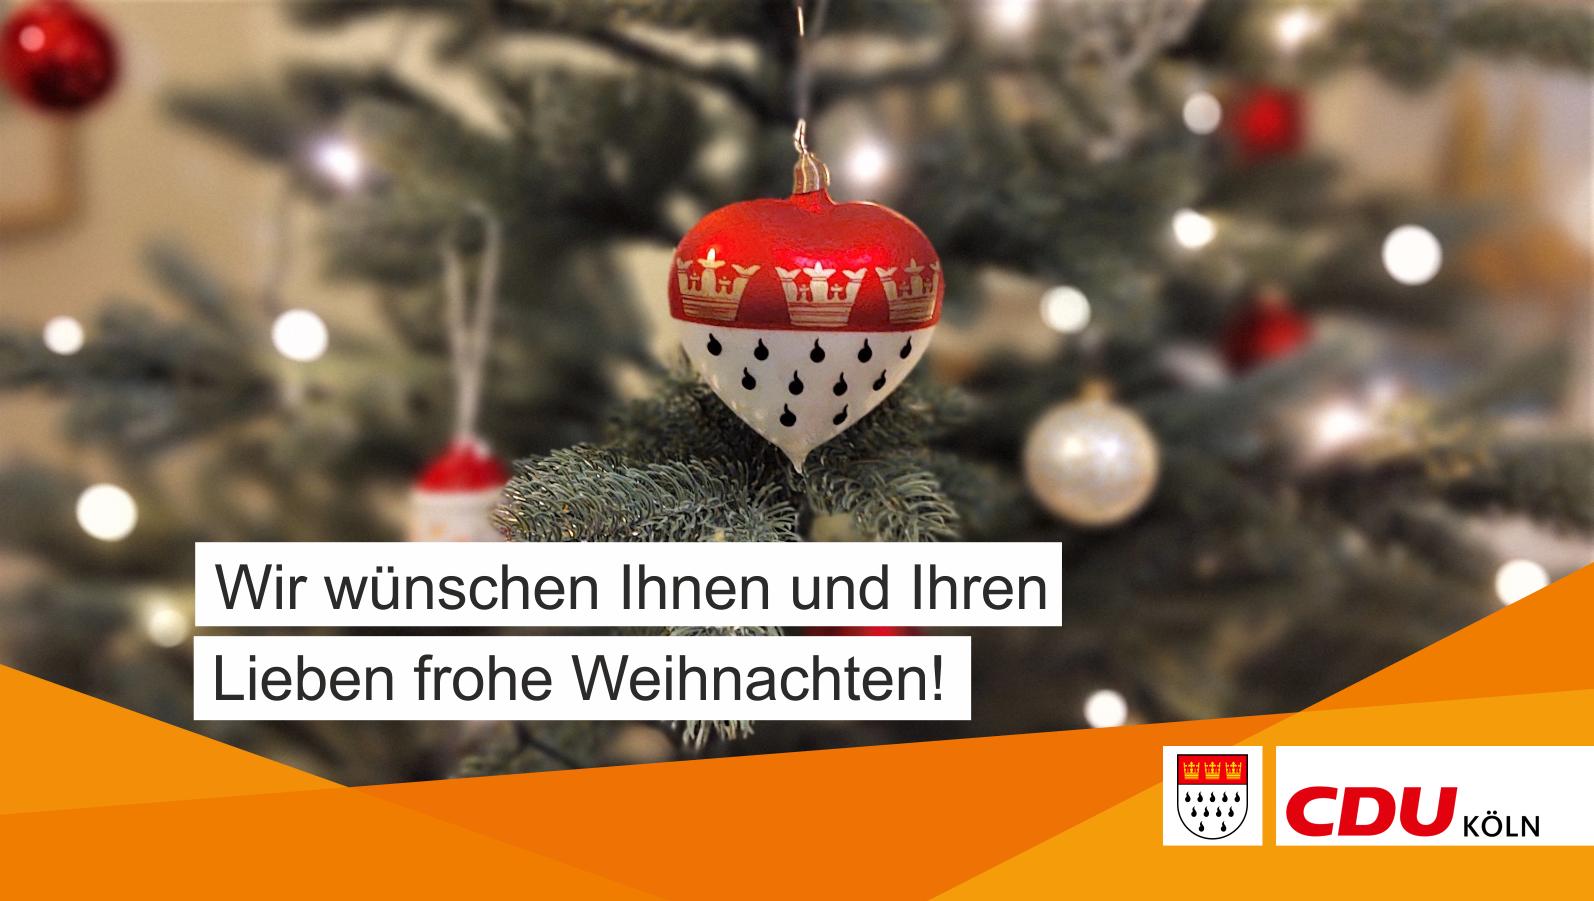 Frohes Weihnachtsfest!